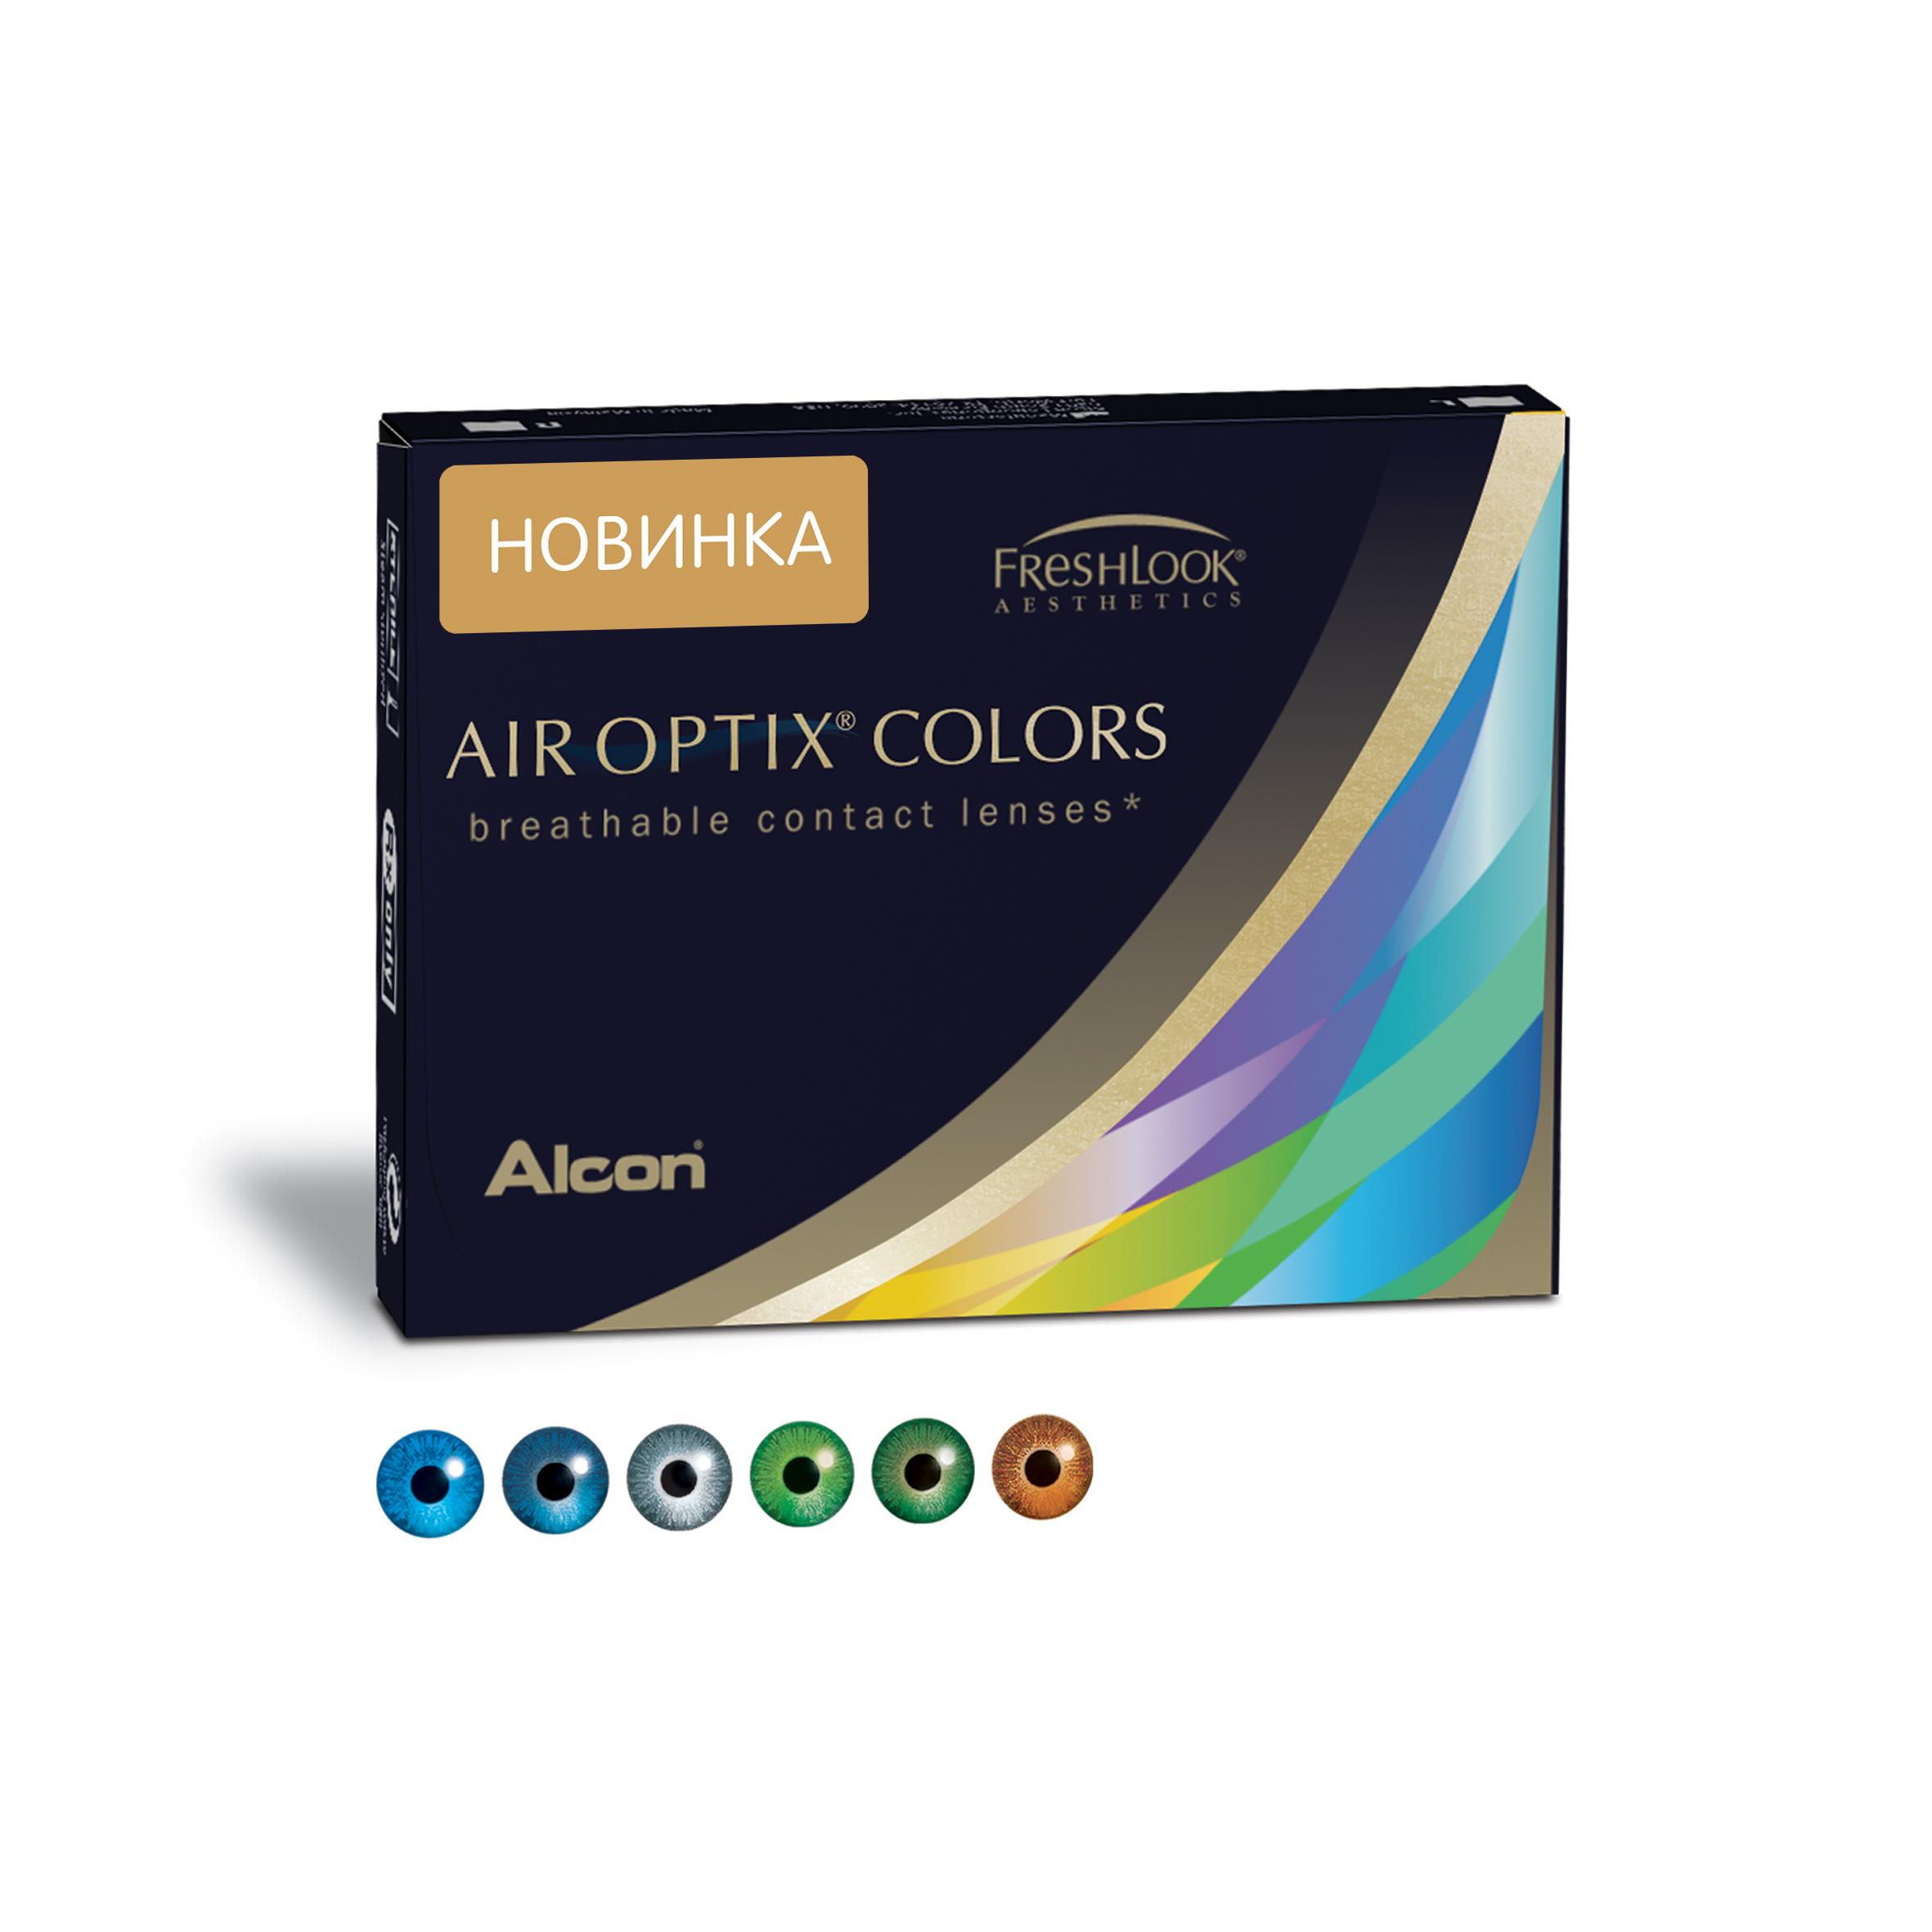 Аlcon контактные линзы Air Optix Colors 2 шт -5.00 Green31746270Мягкие контактные линзы